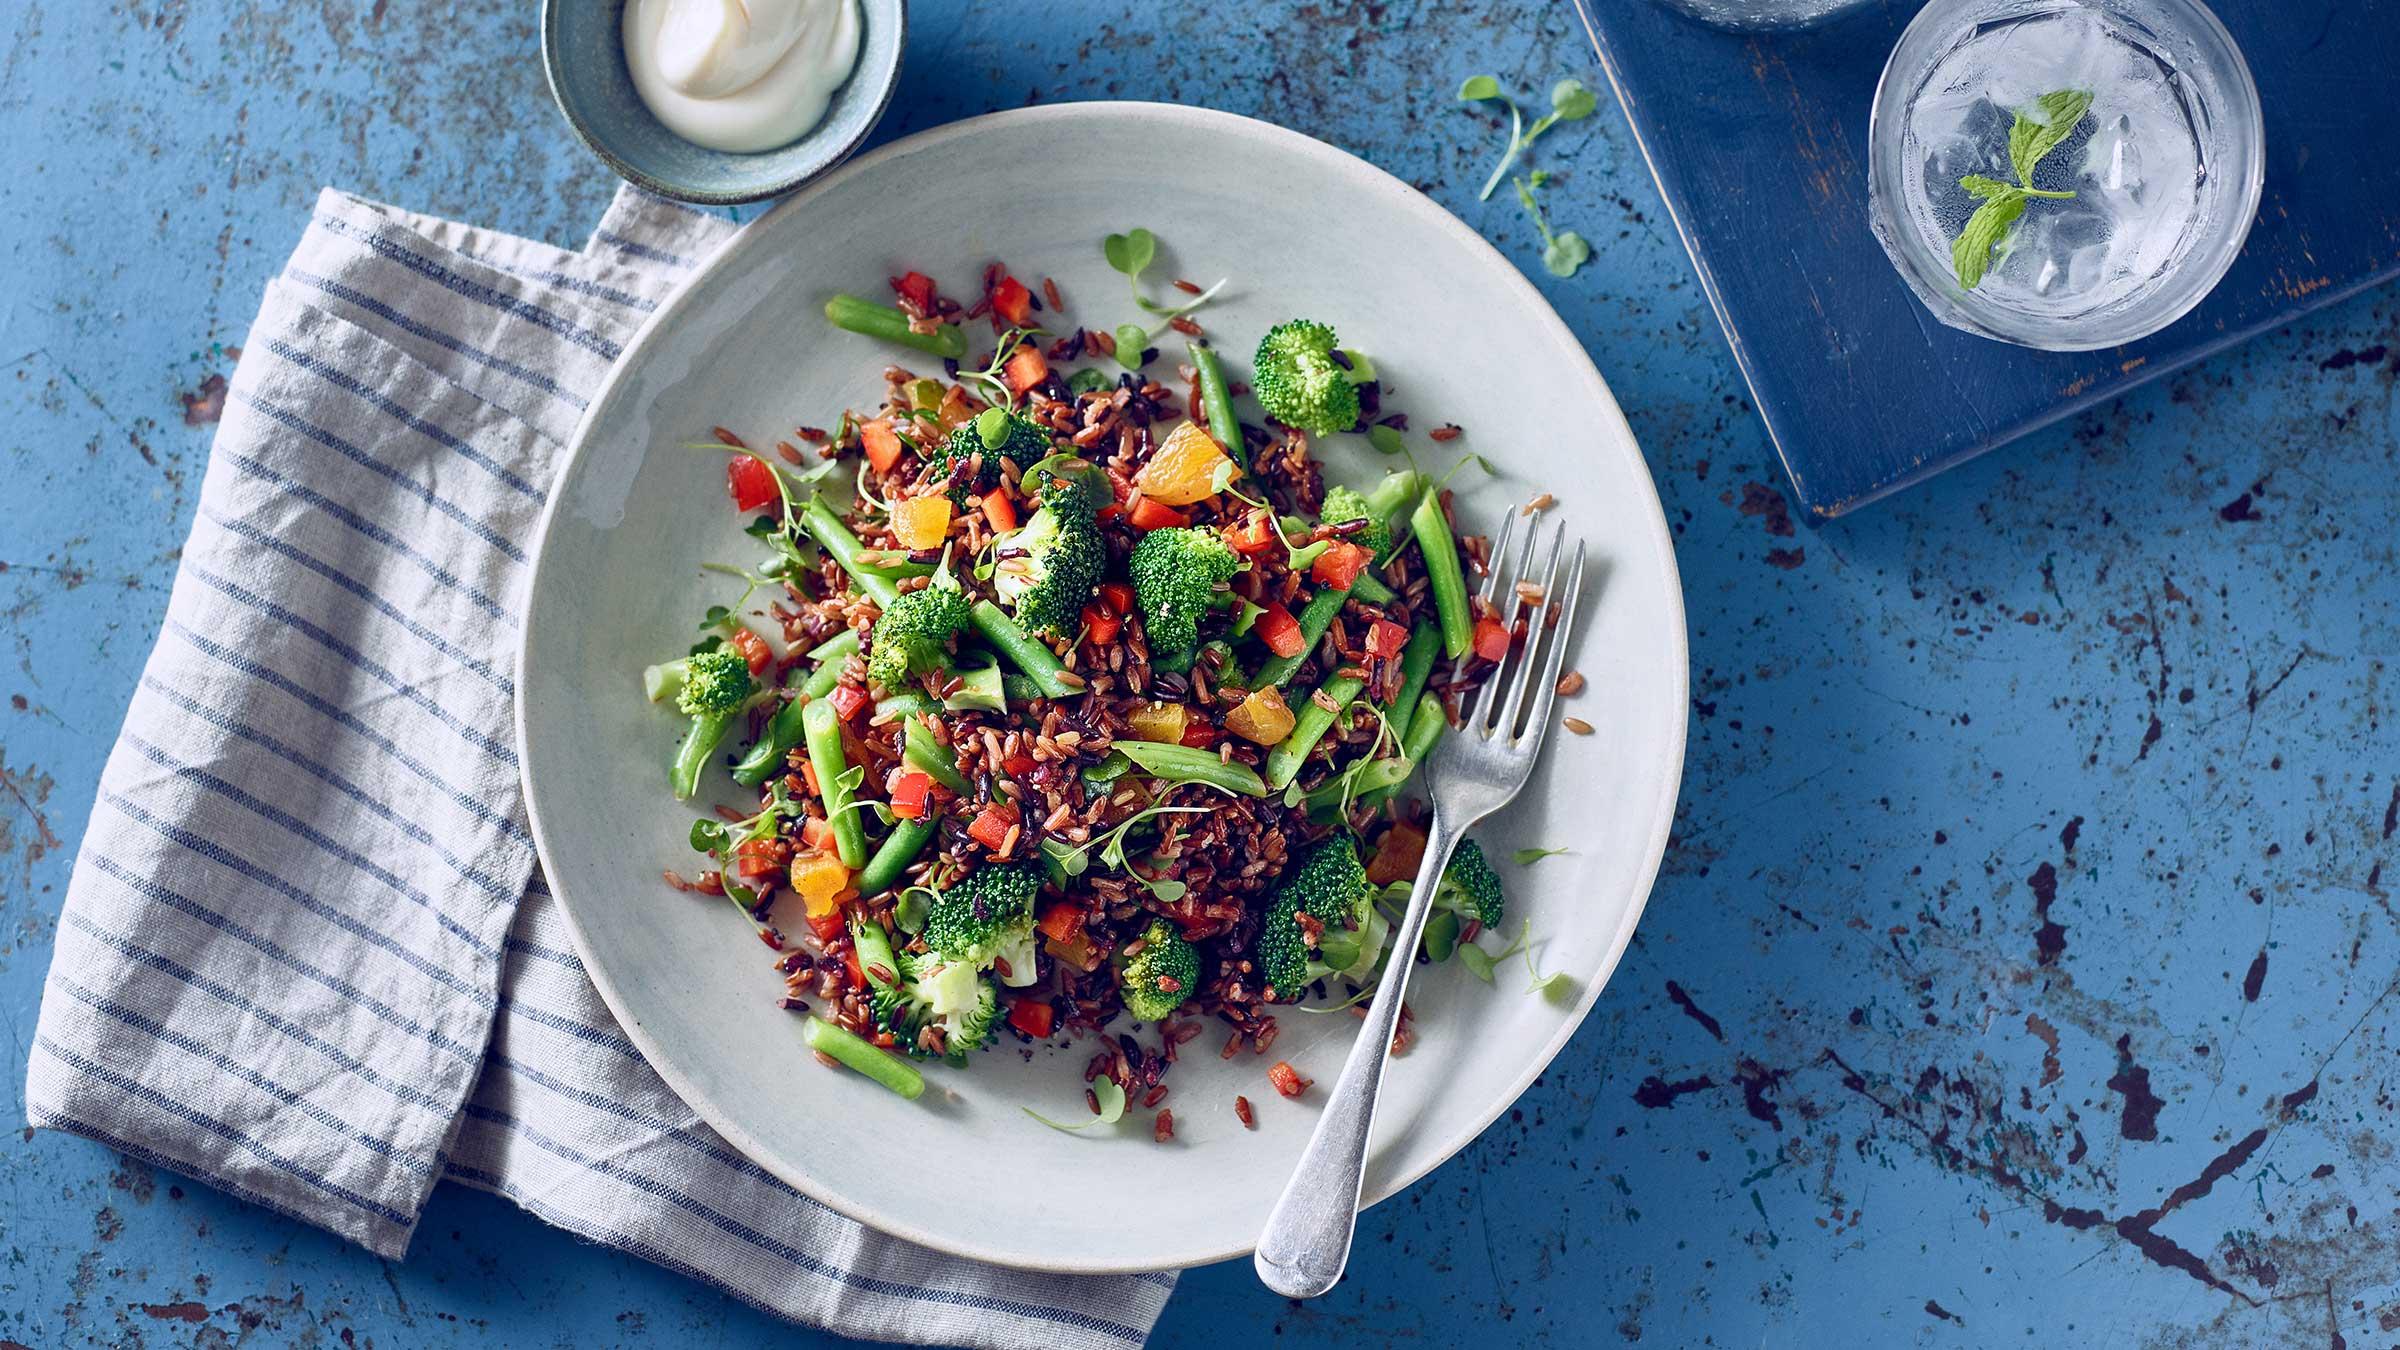 Salmon with Wild Rice & Veggies